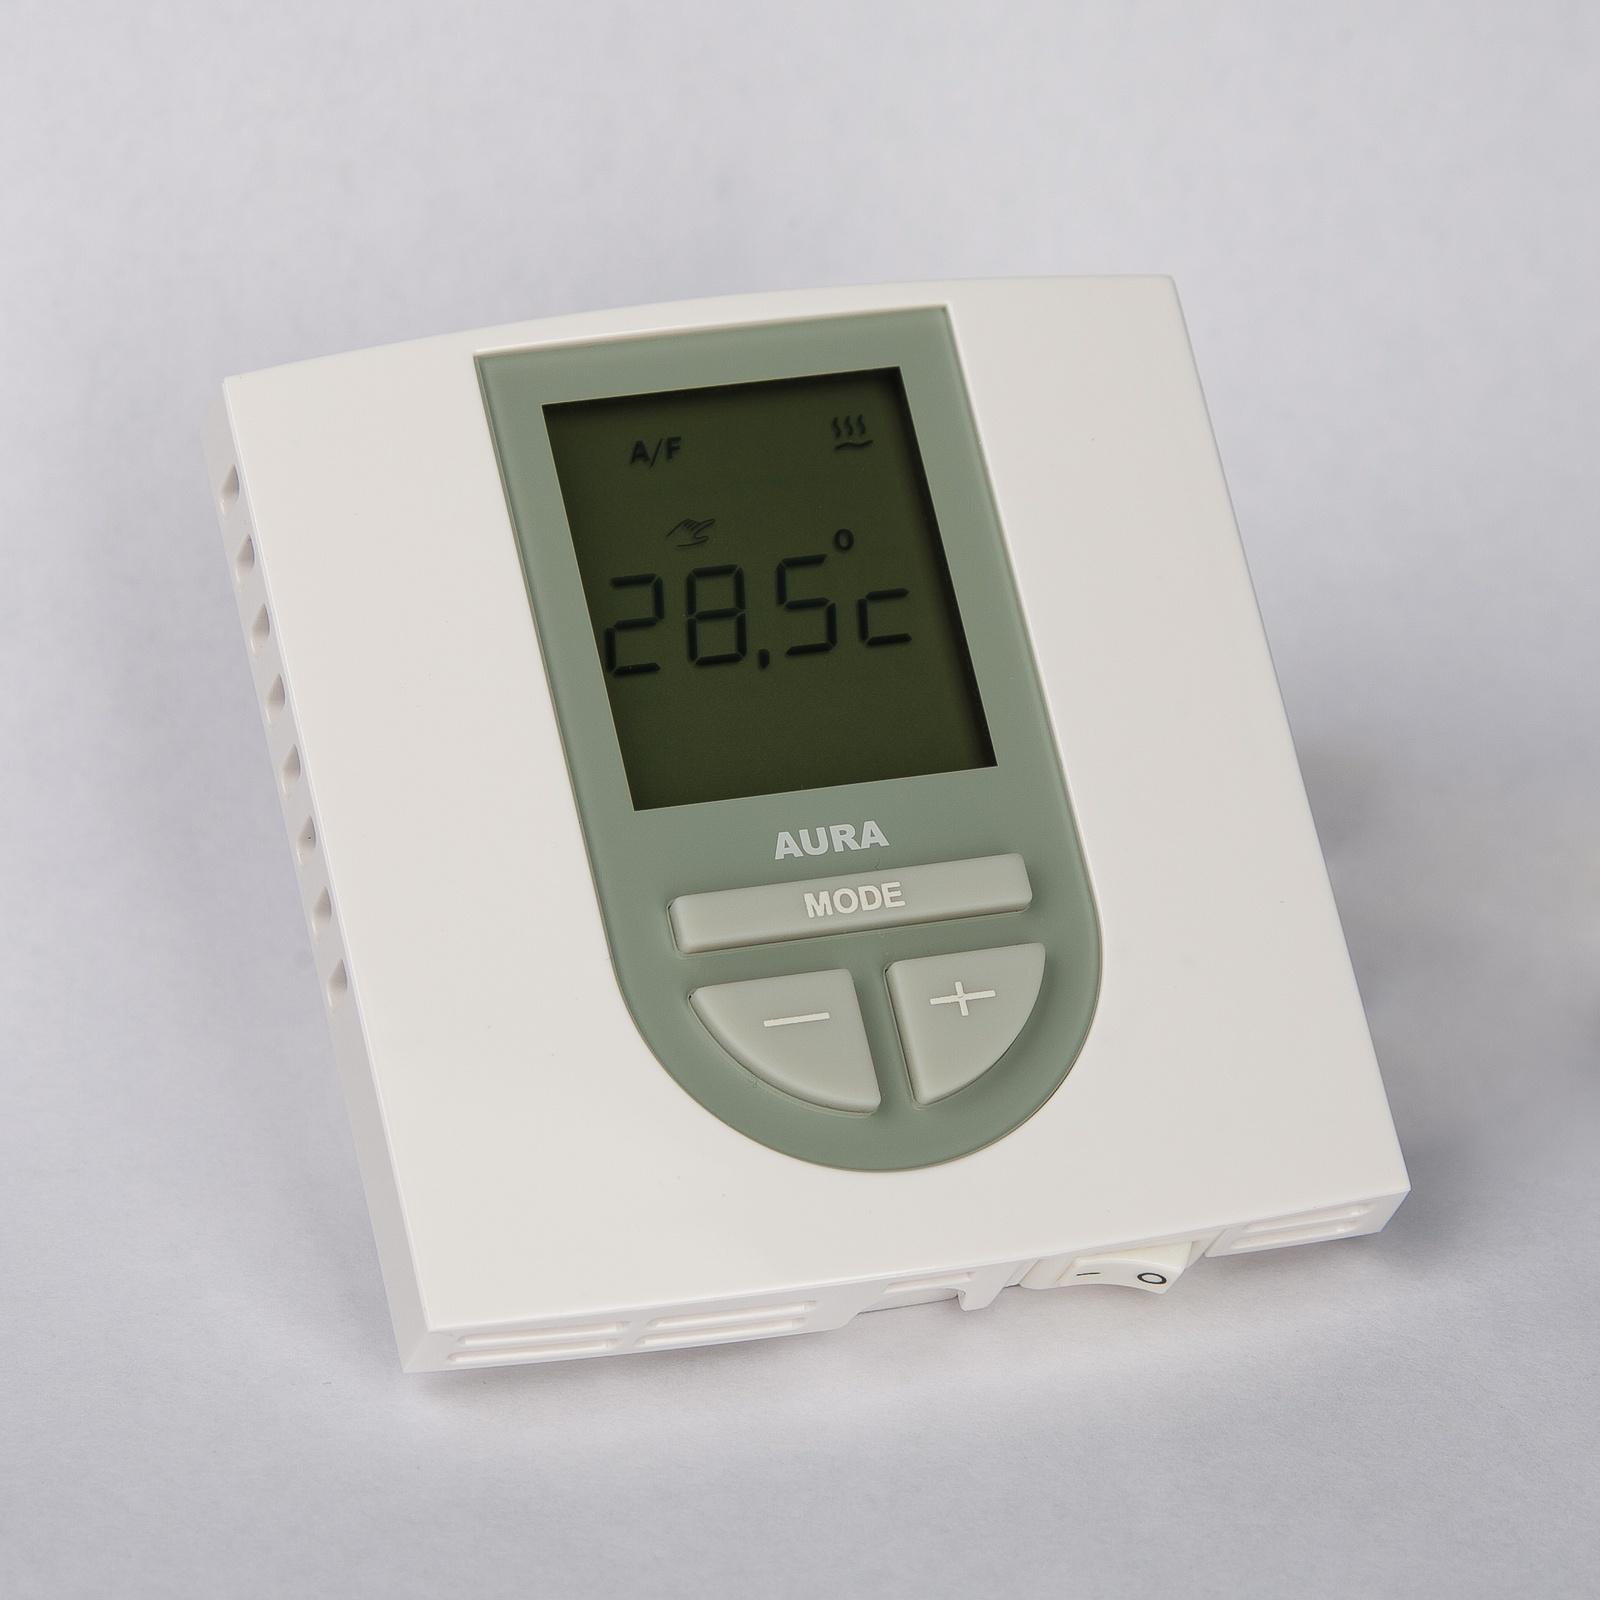 Регулятор теплого пола AURA VTC 550, 3101550, белый цена